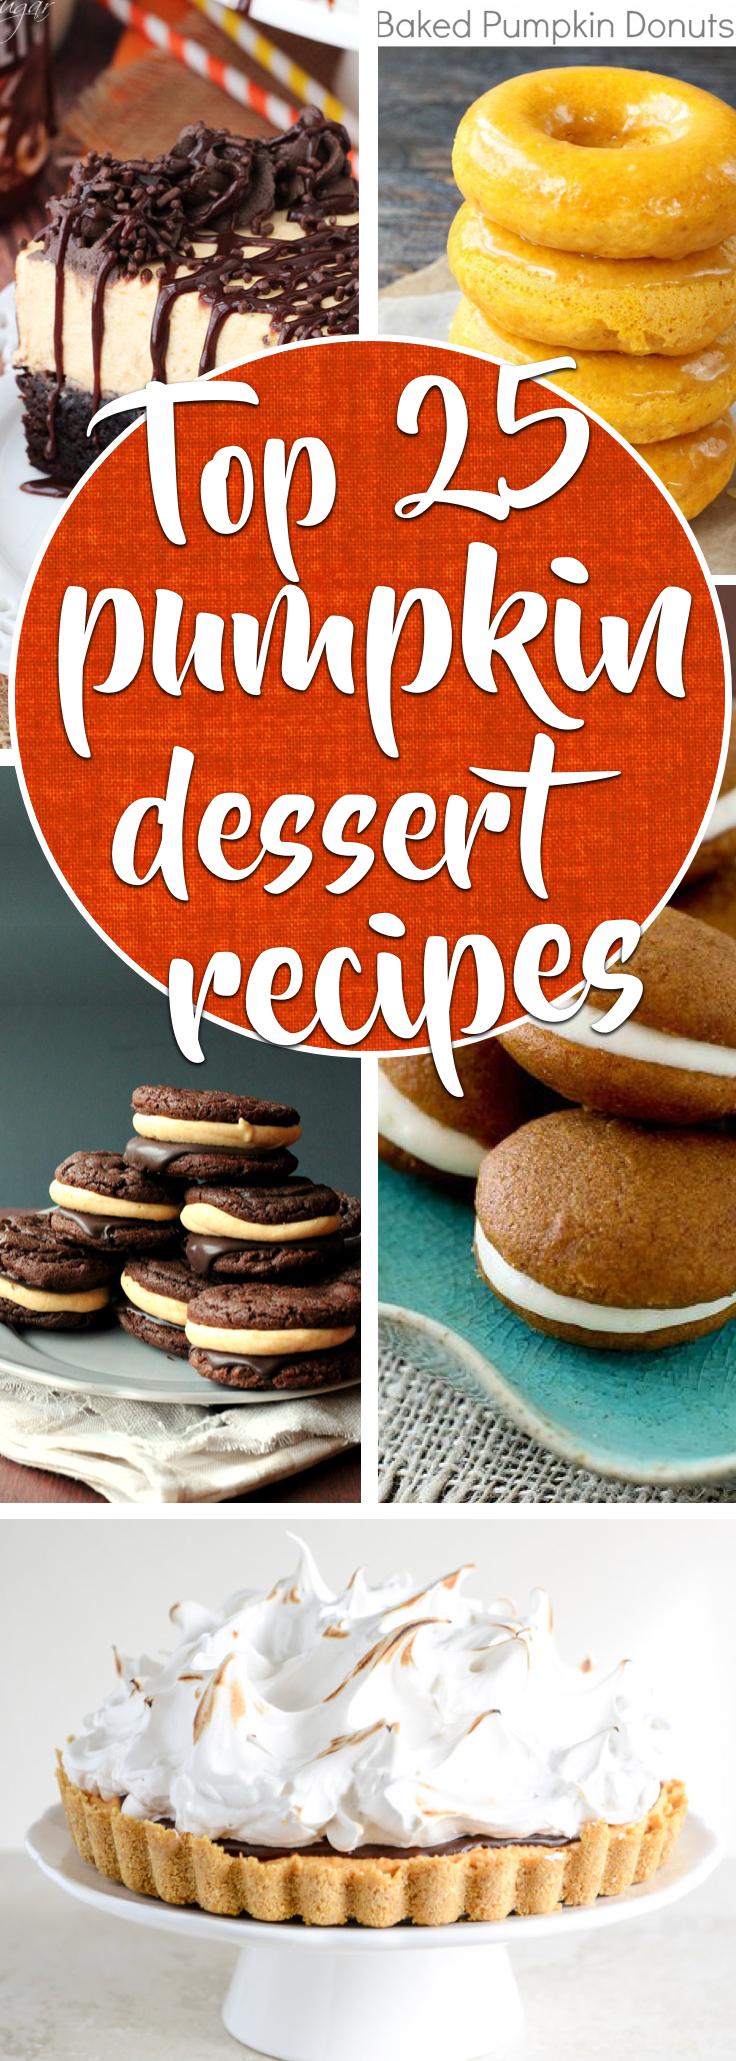 Top 25 Pumpkin Dessert Recipes Adding a Dose of Sugar To The Fall Season